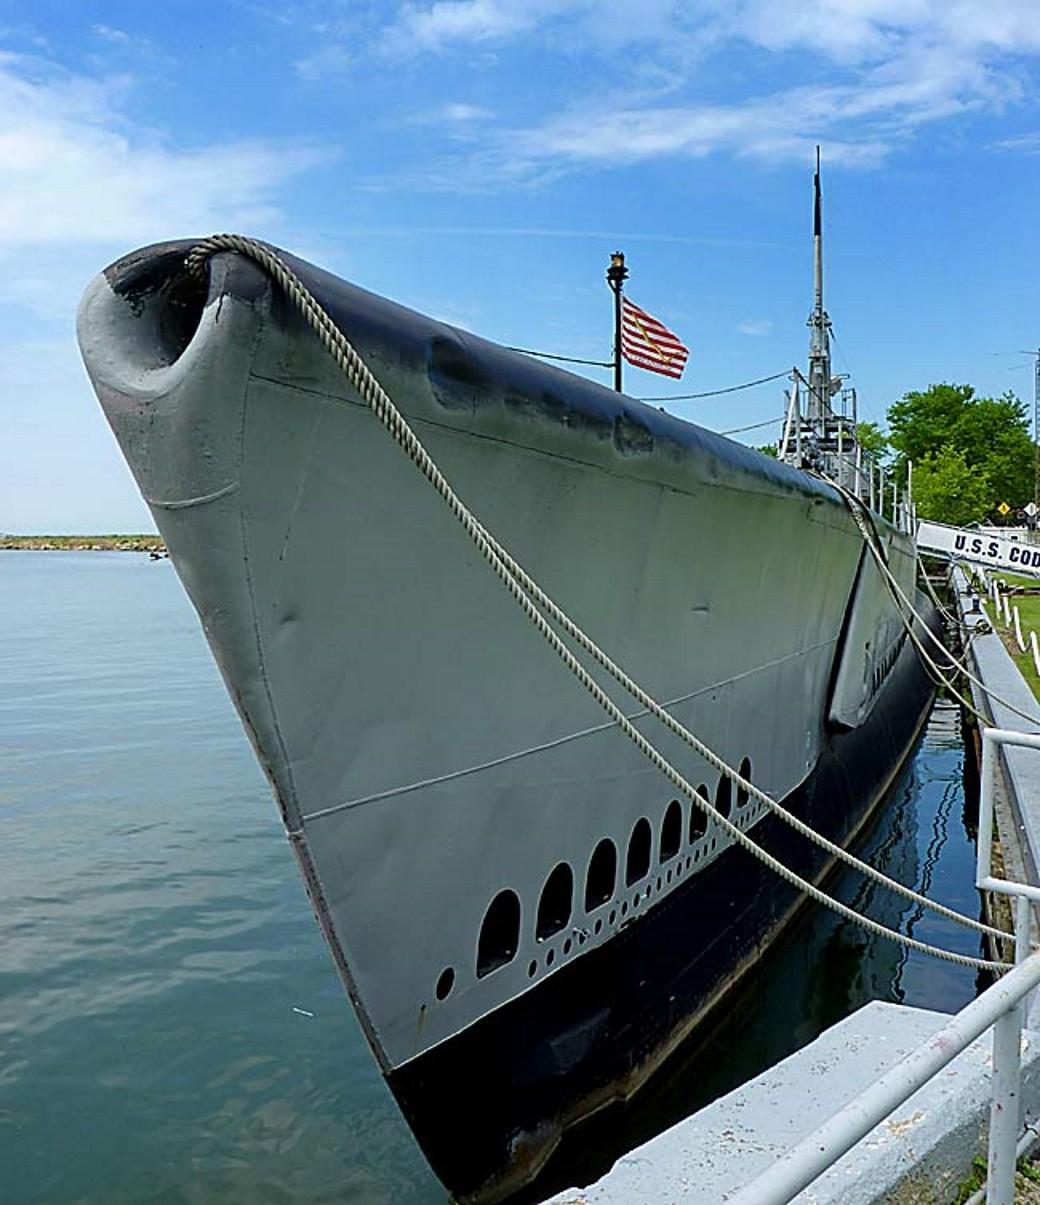 USS Cod - Omrknout